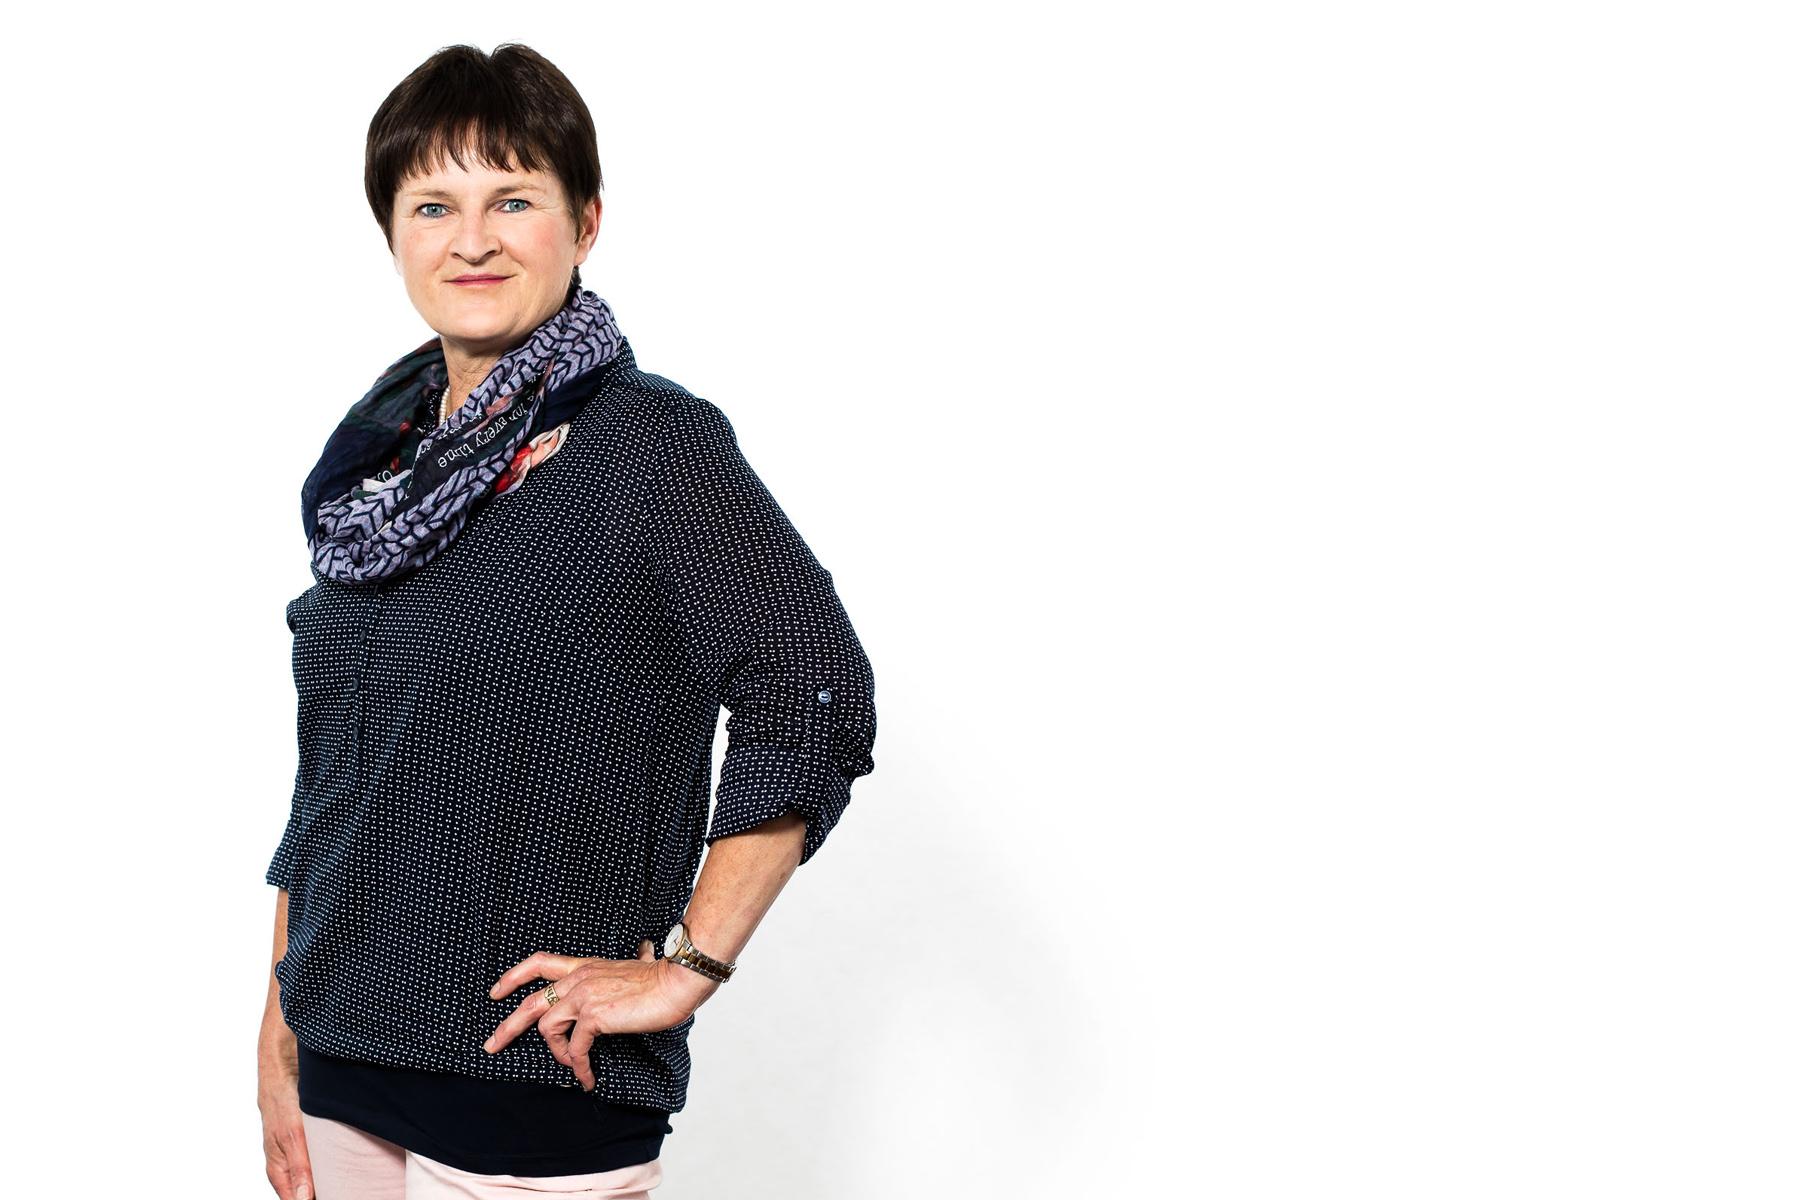 Gulde Mielke Frey Gudrun Welte